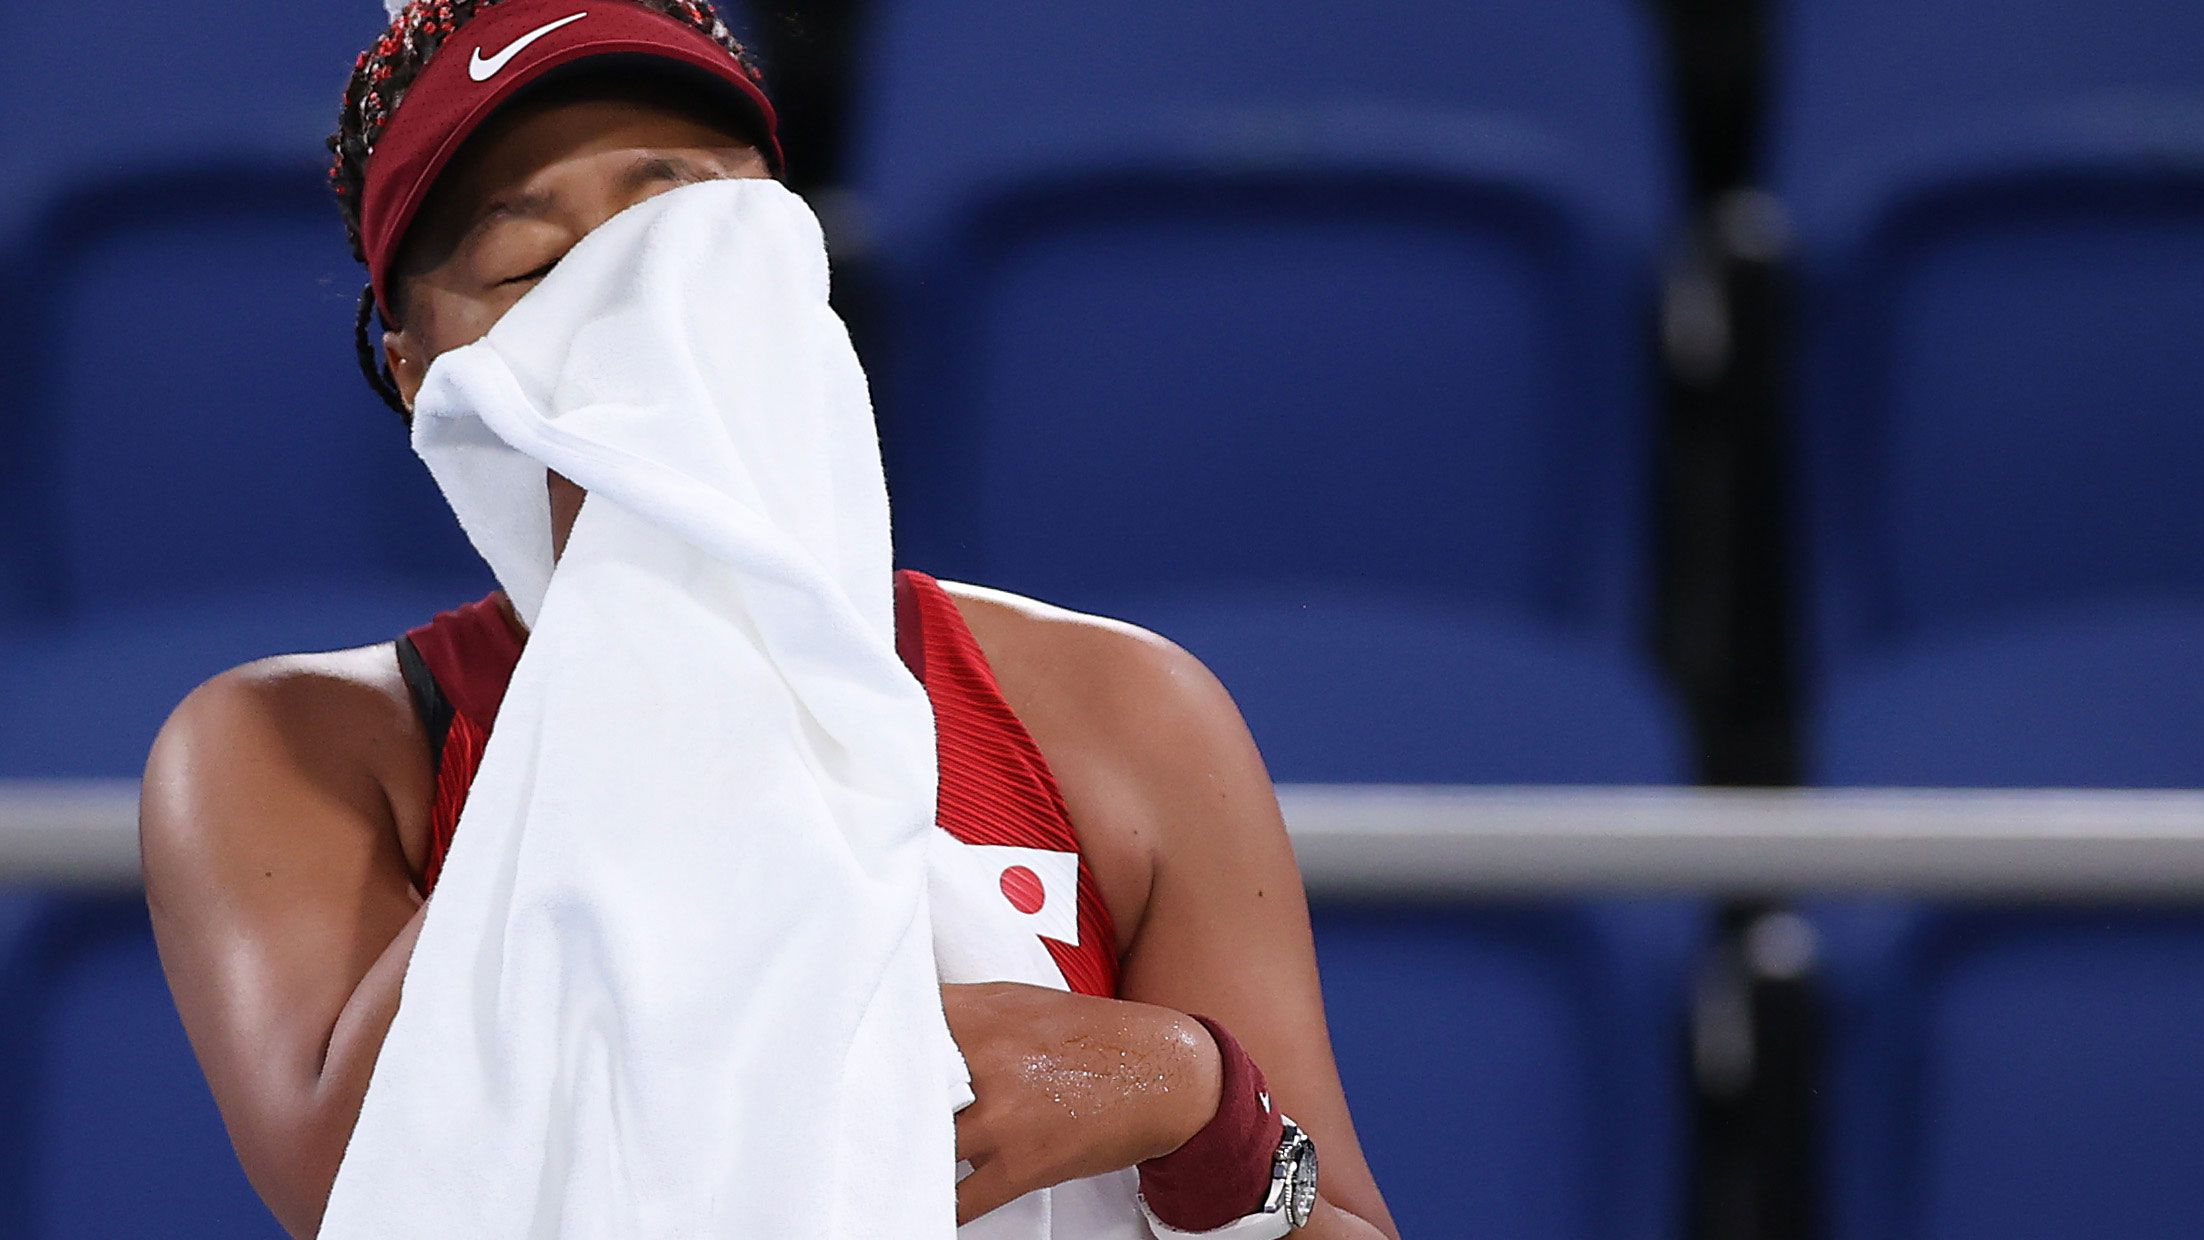 Japanese star Naomi Osaka cuts a distressed figure during her loss against Markéta Vondroušová.